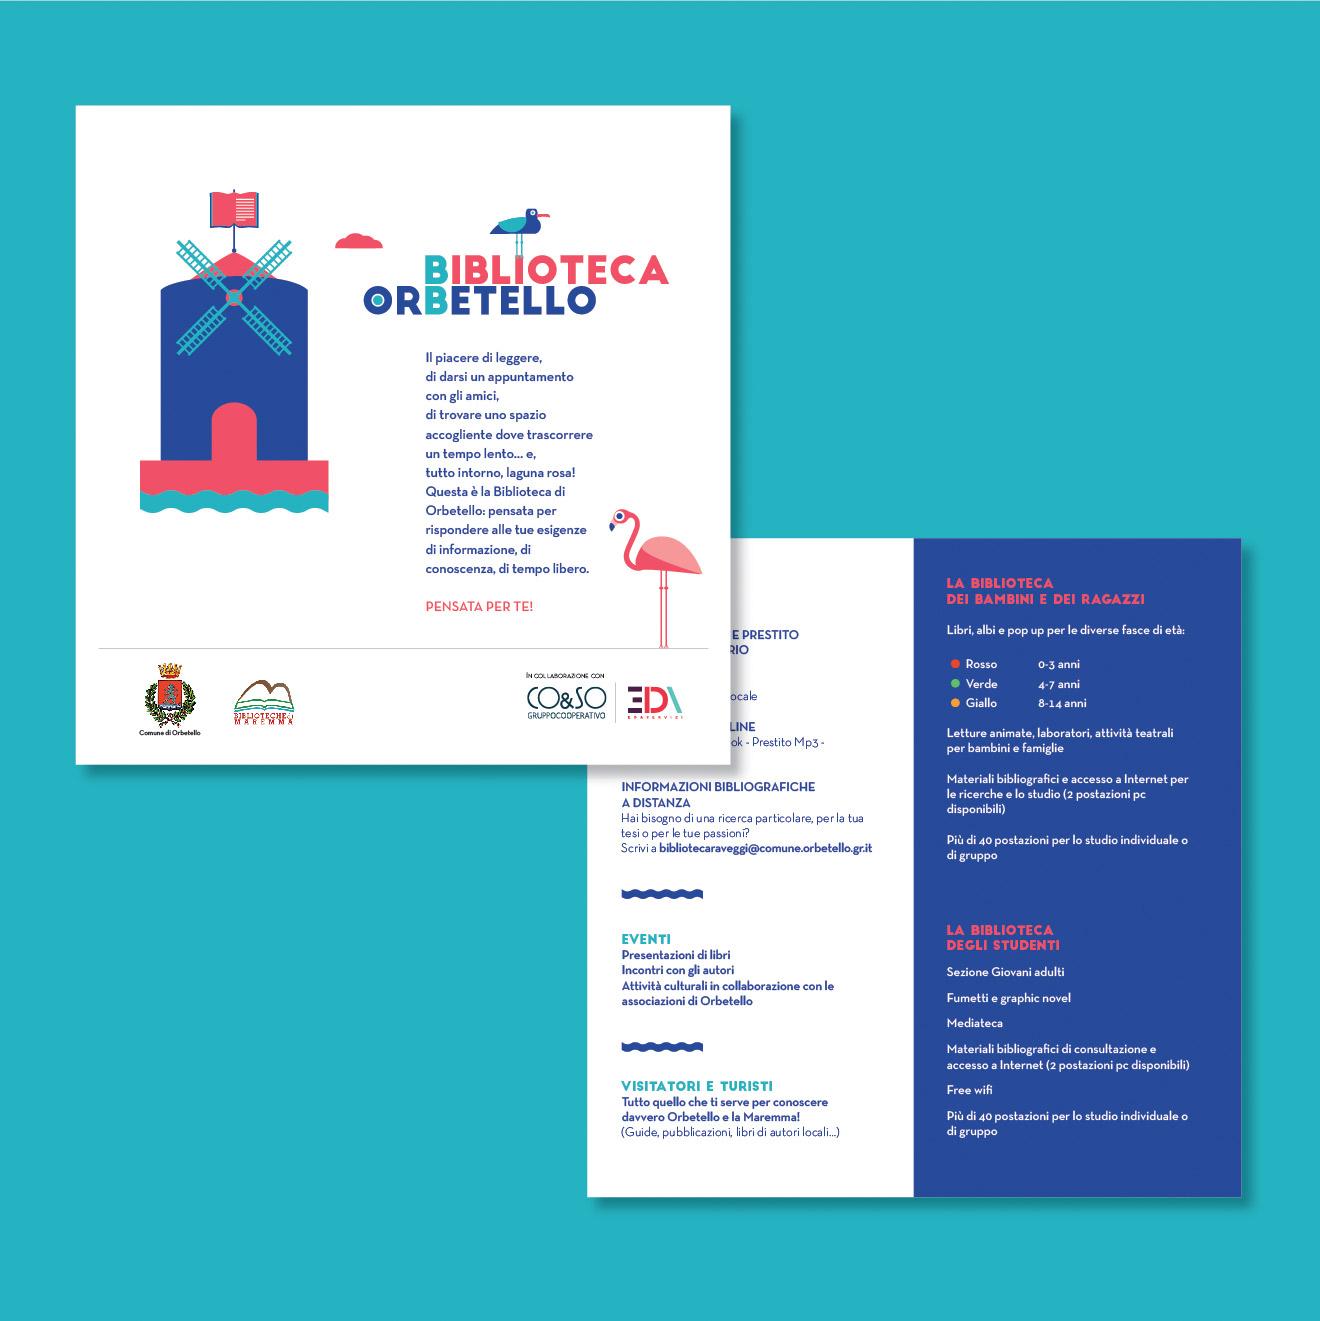 immagine coordinata - biblioteca Pietro Raveggi - volantino